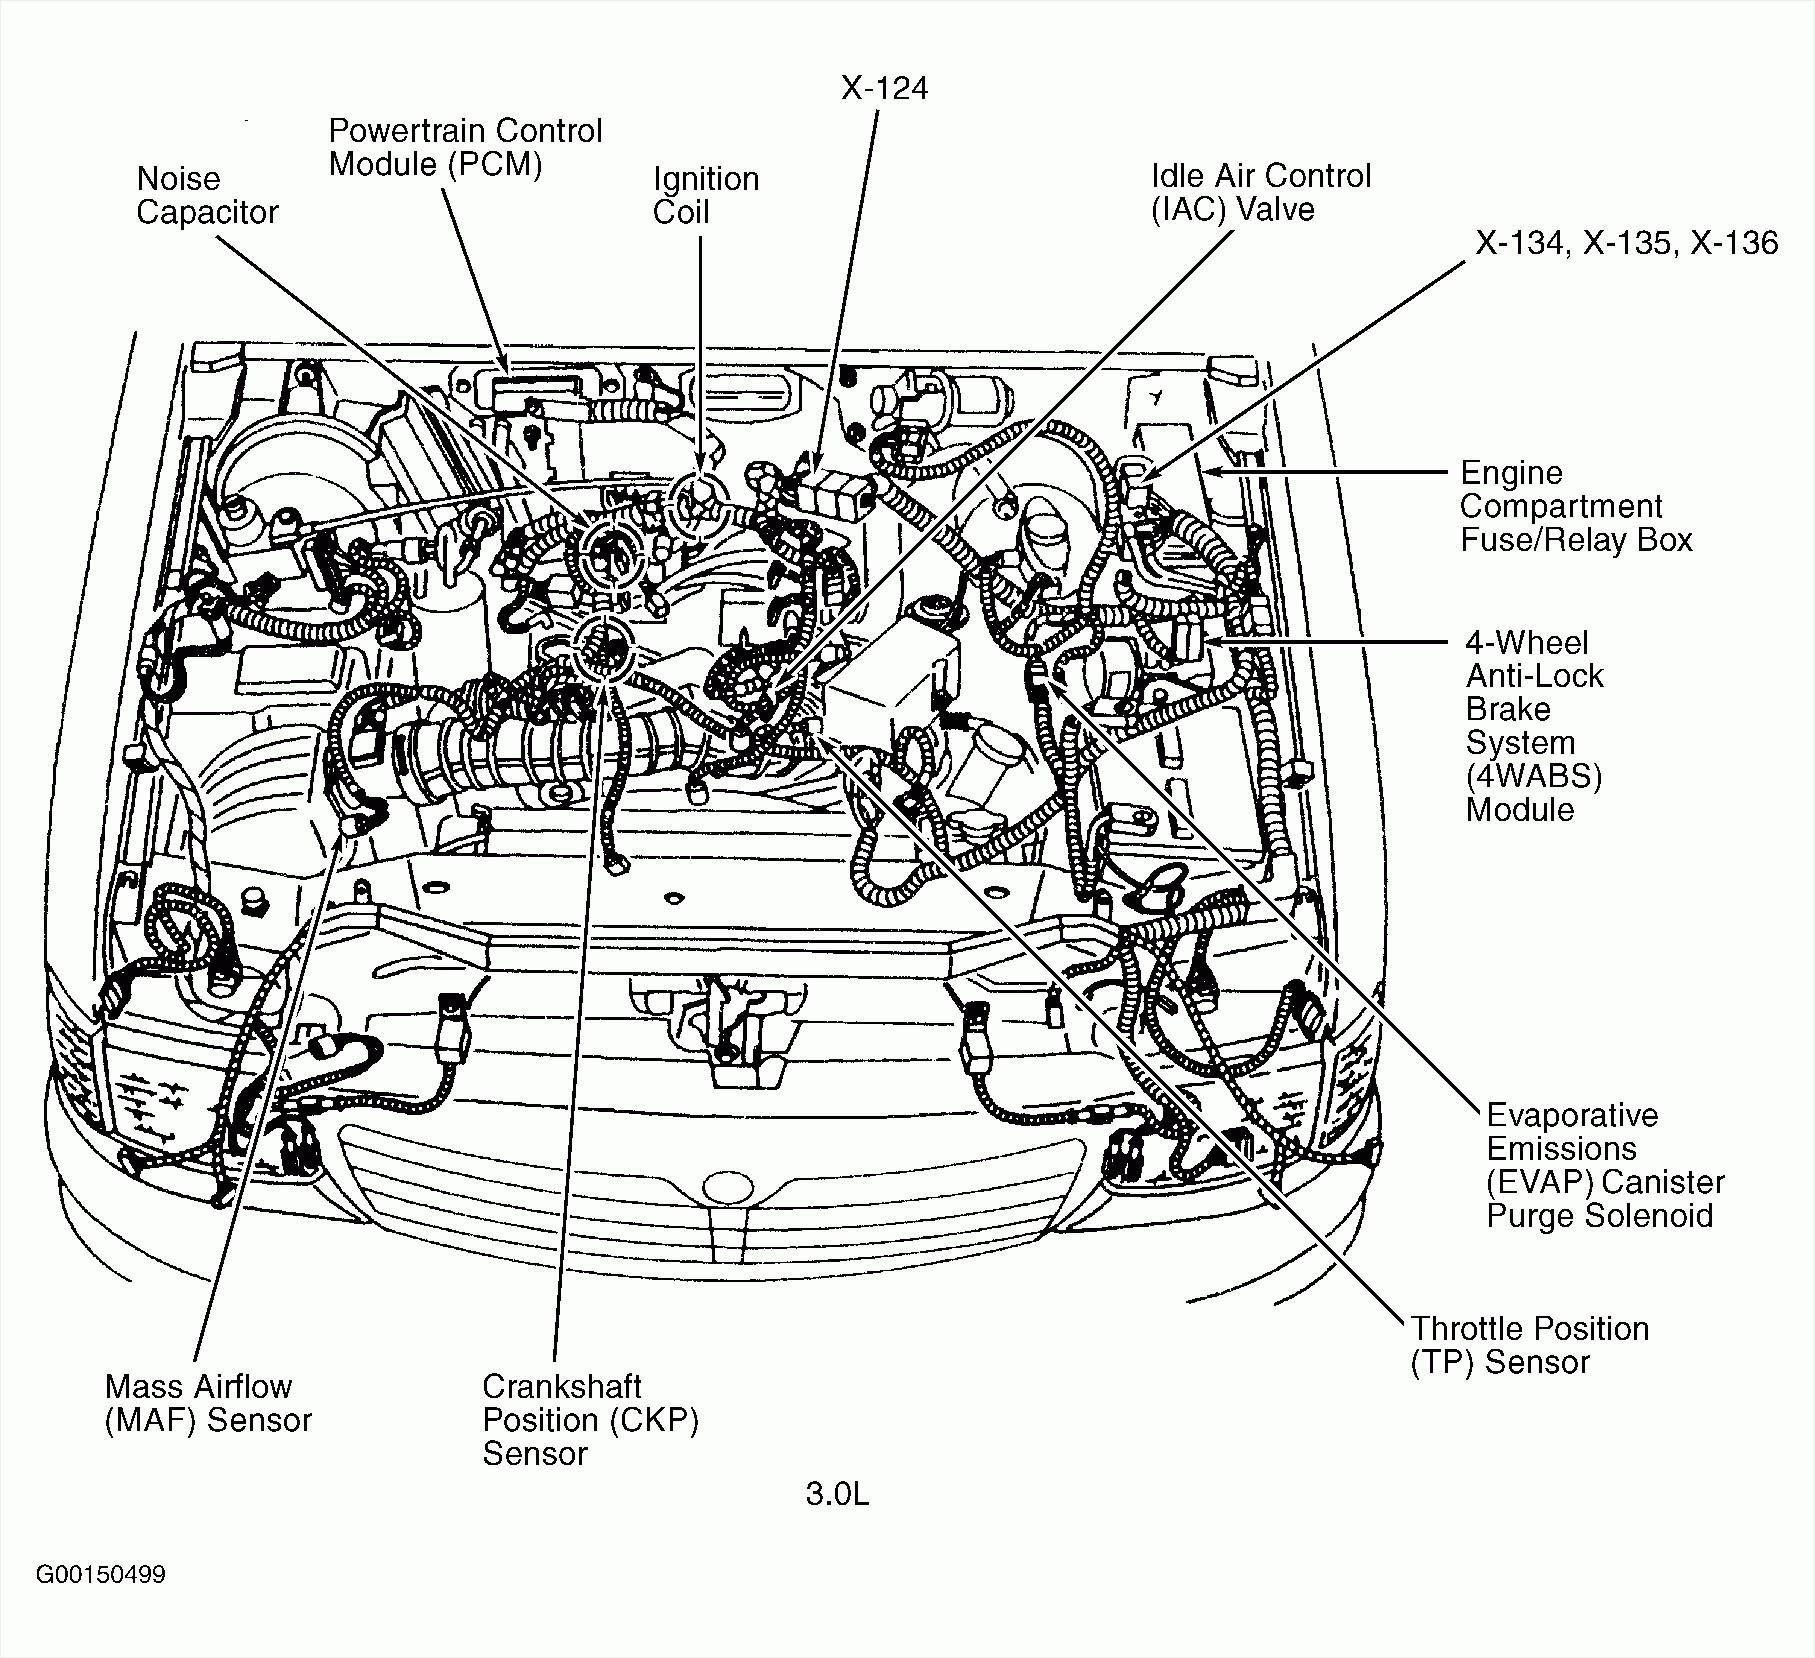 ignition system wiring diagram on 1987 mazda b2000 fuse box diagram